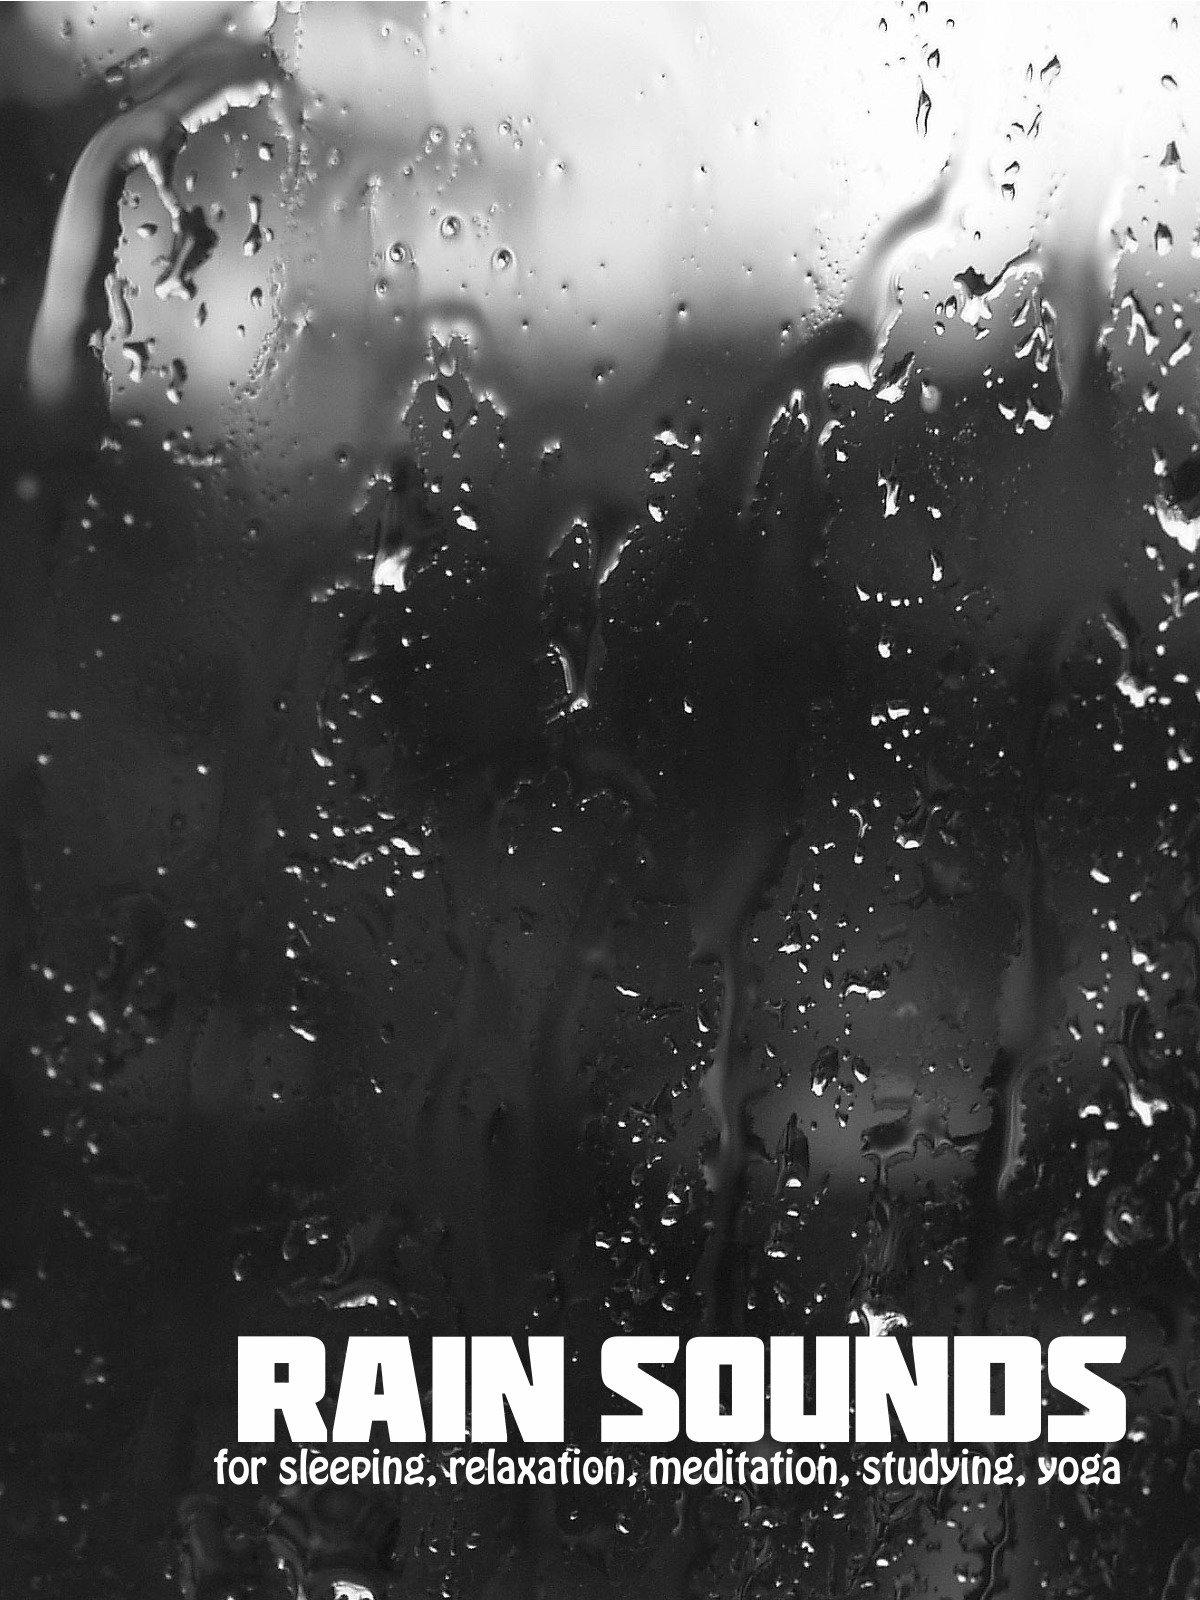 rain sounds for sleeping, relaxation, meditation, studying, yoga